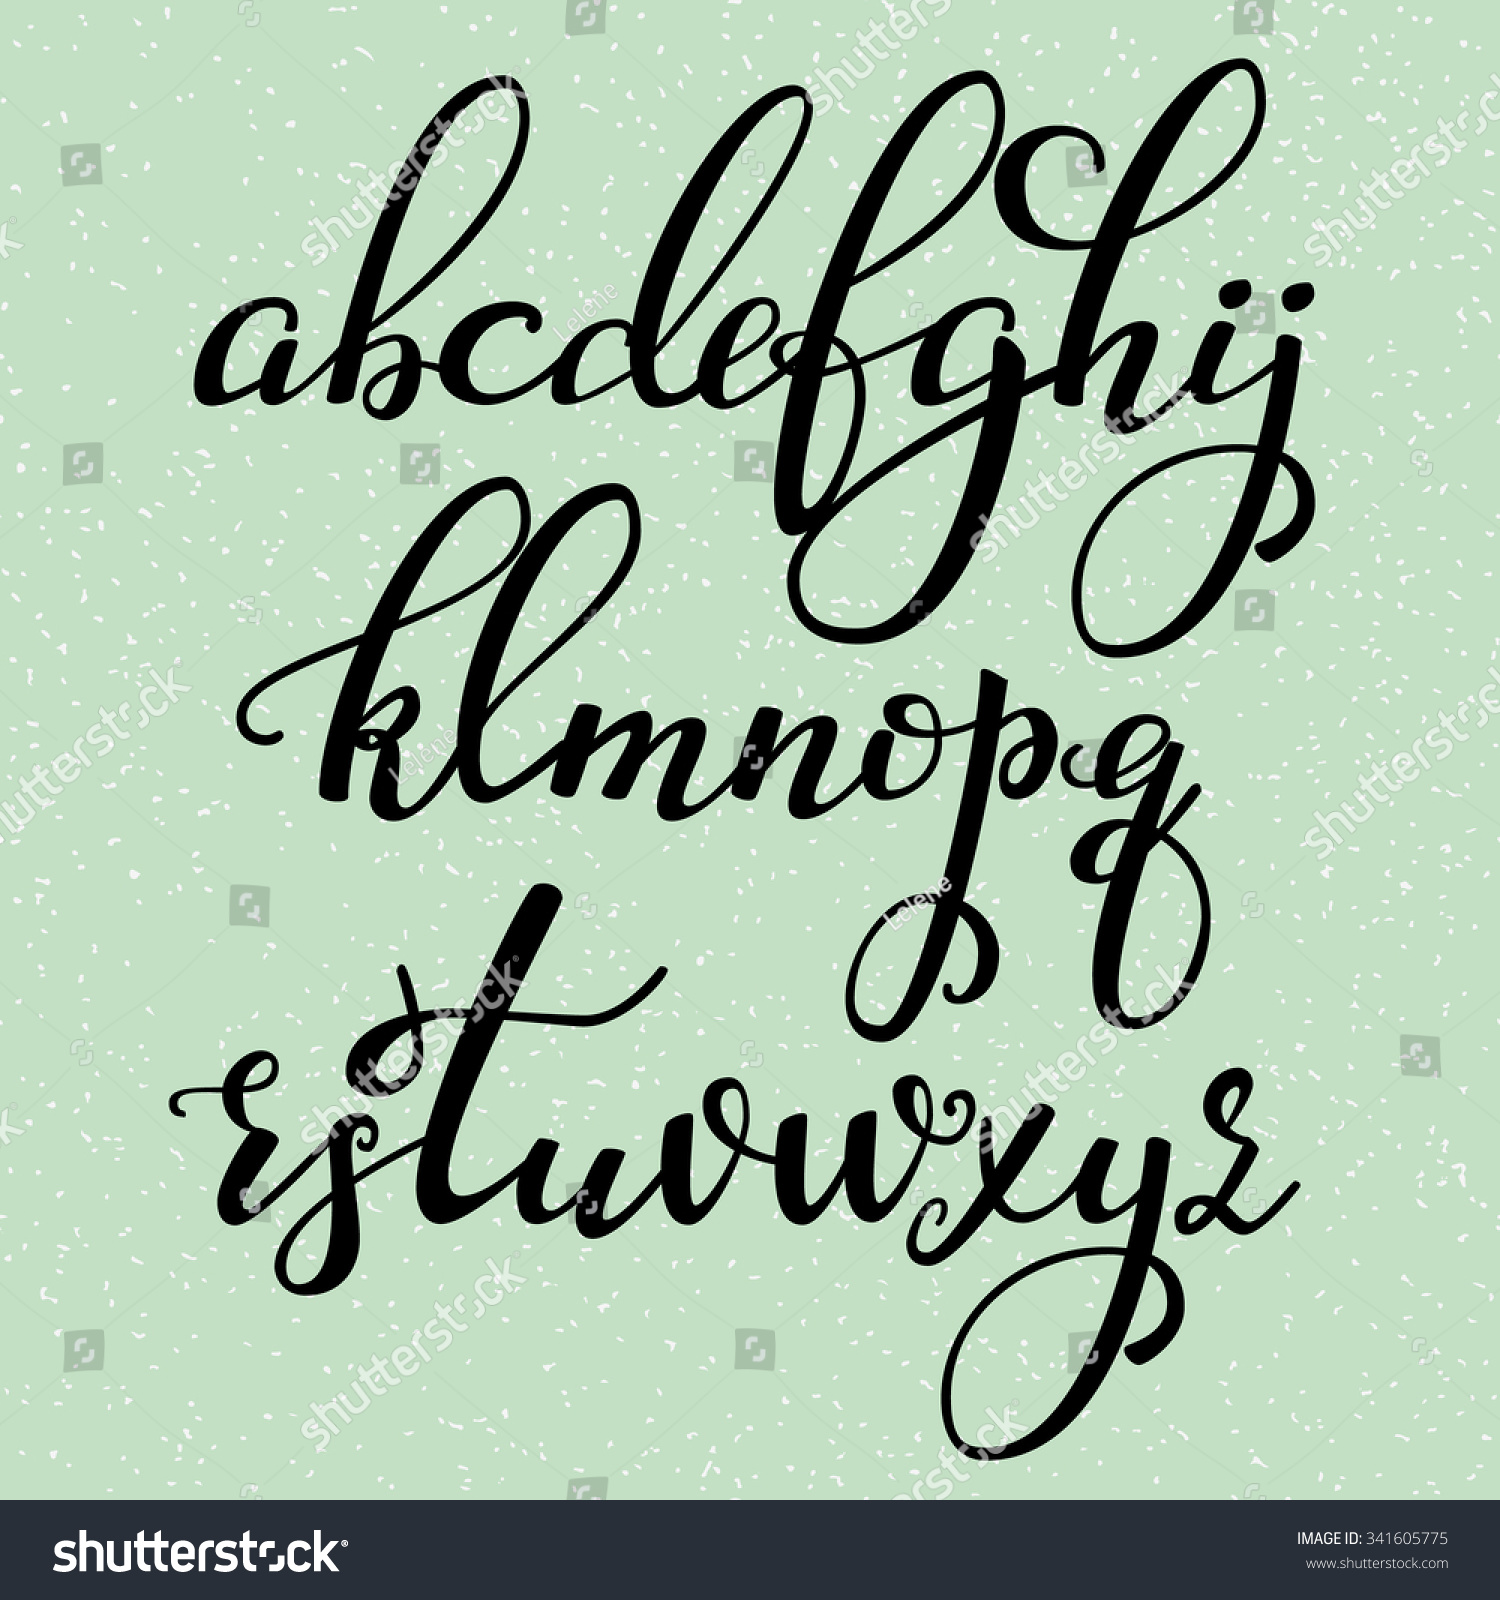 Handwritten brush style modern calligraphy images